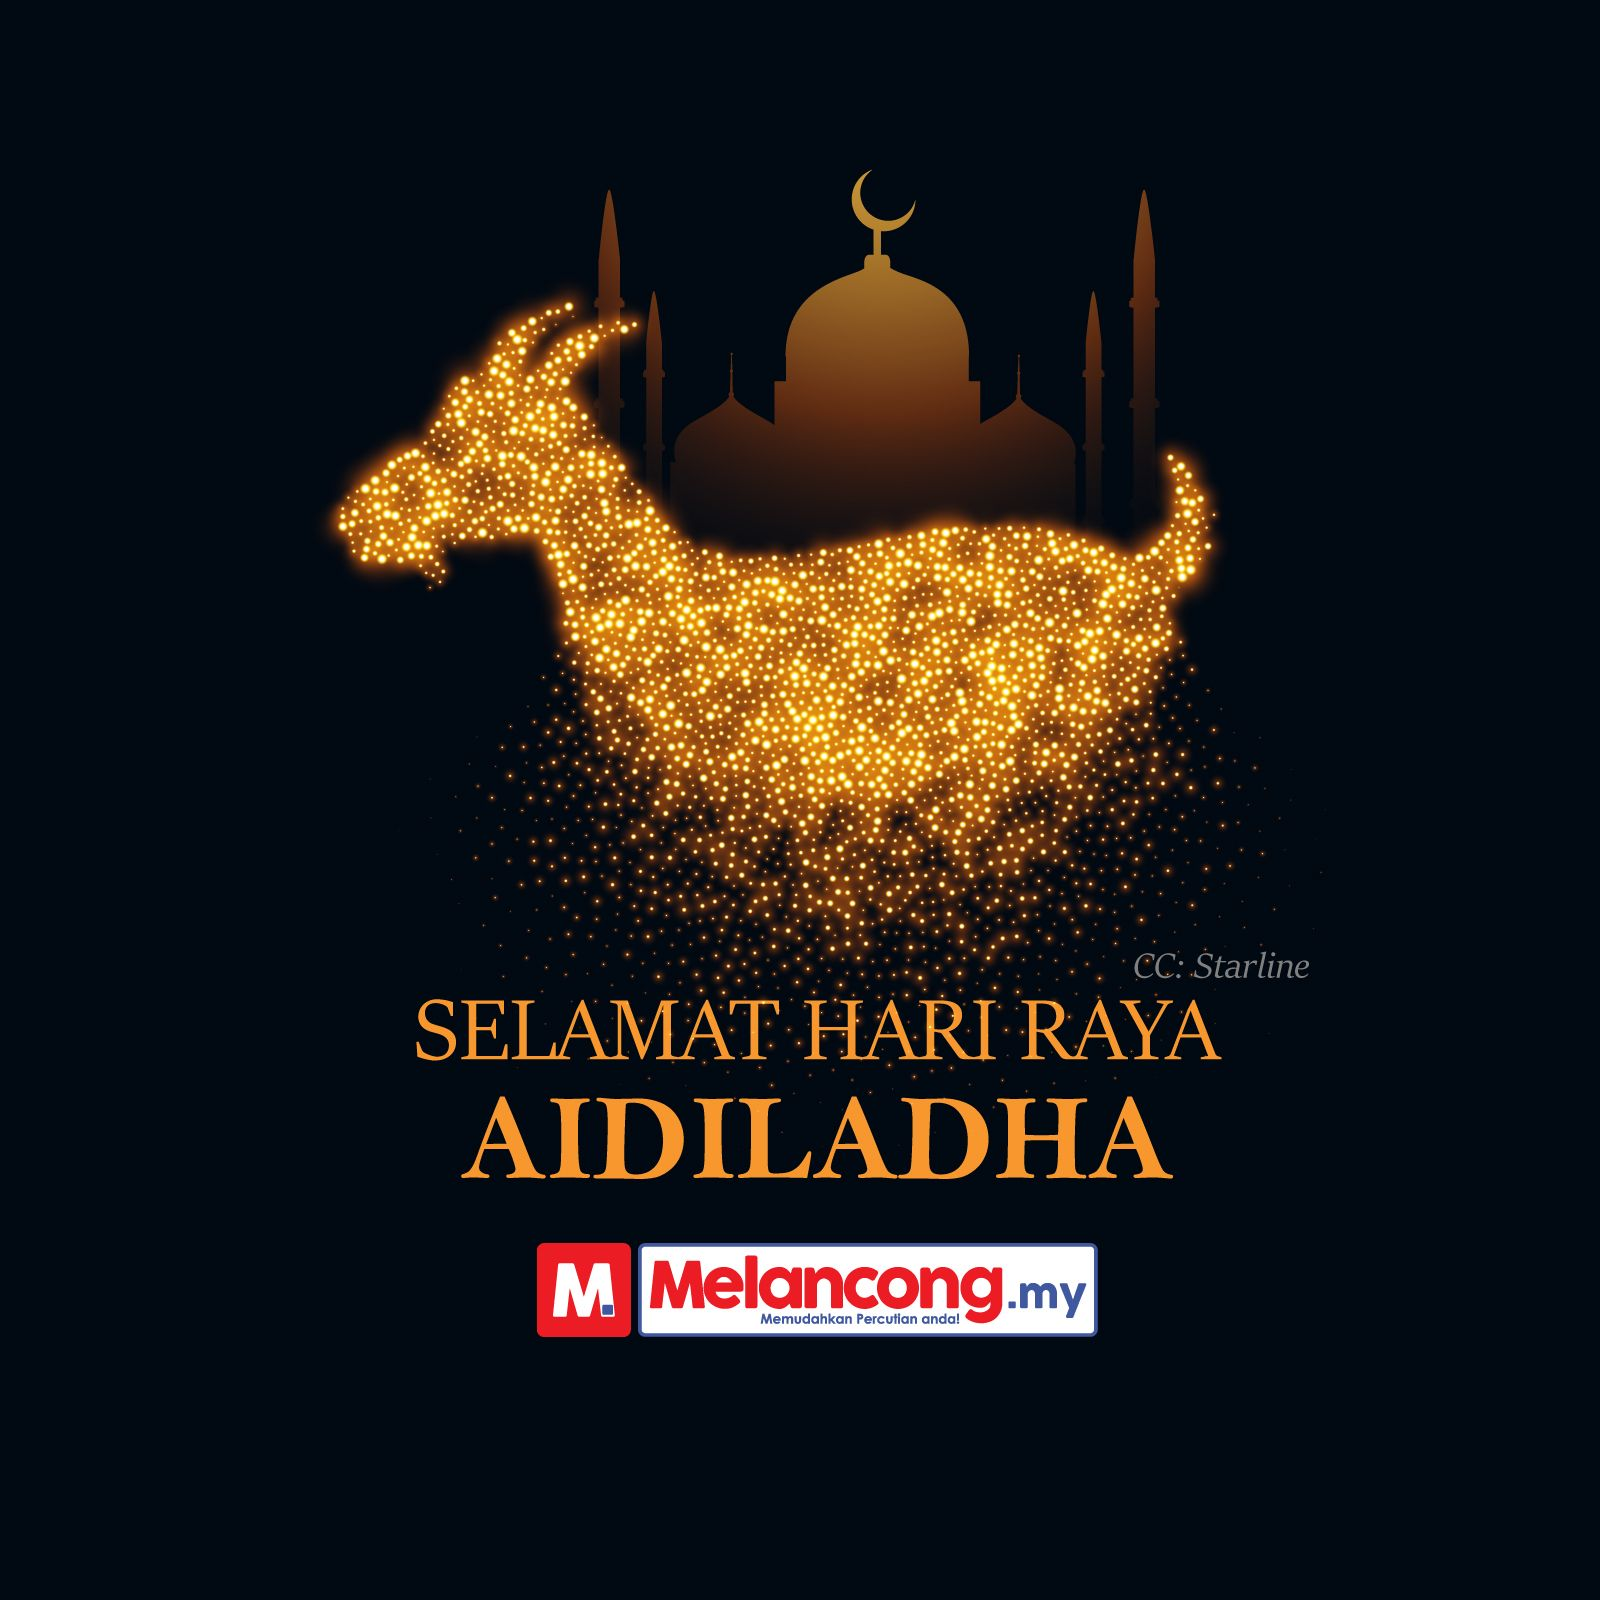 Salam Aidiladha 1440 H Dari Melancong My Poster Movie Posters Movies